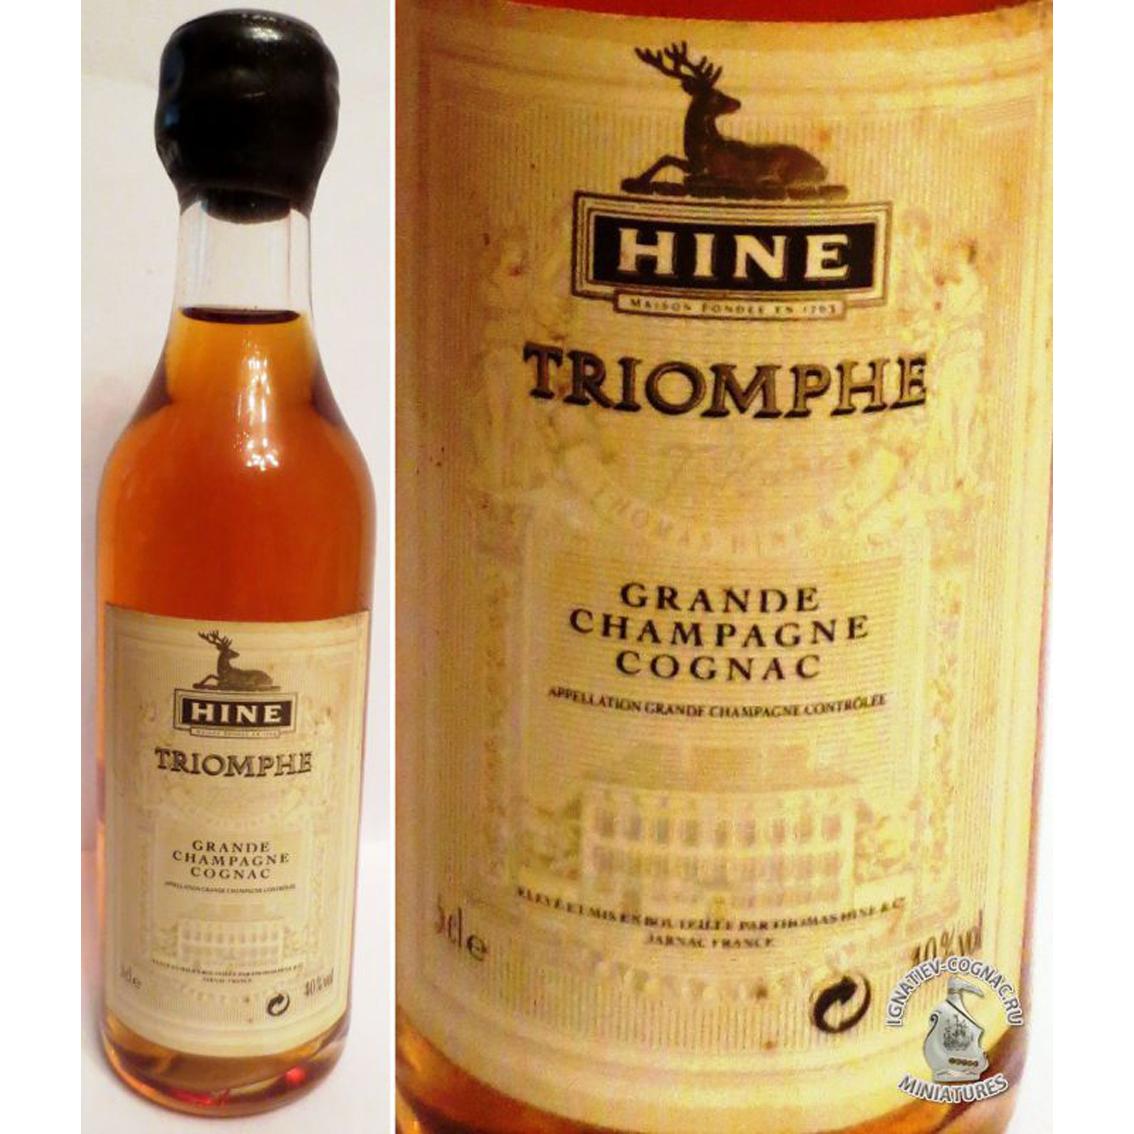 COGNAC-HINE-TRIOMPHE-W